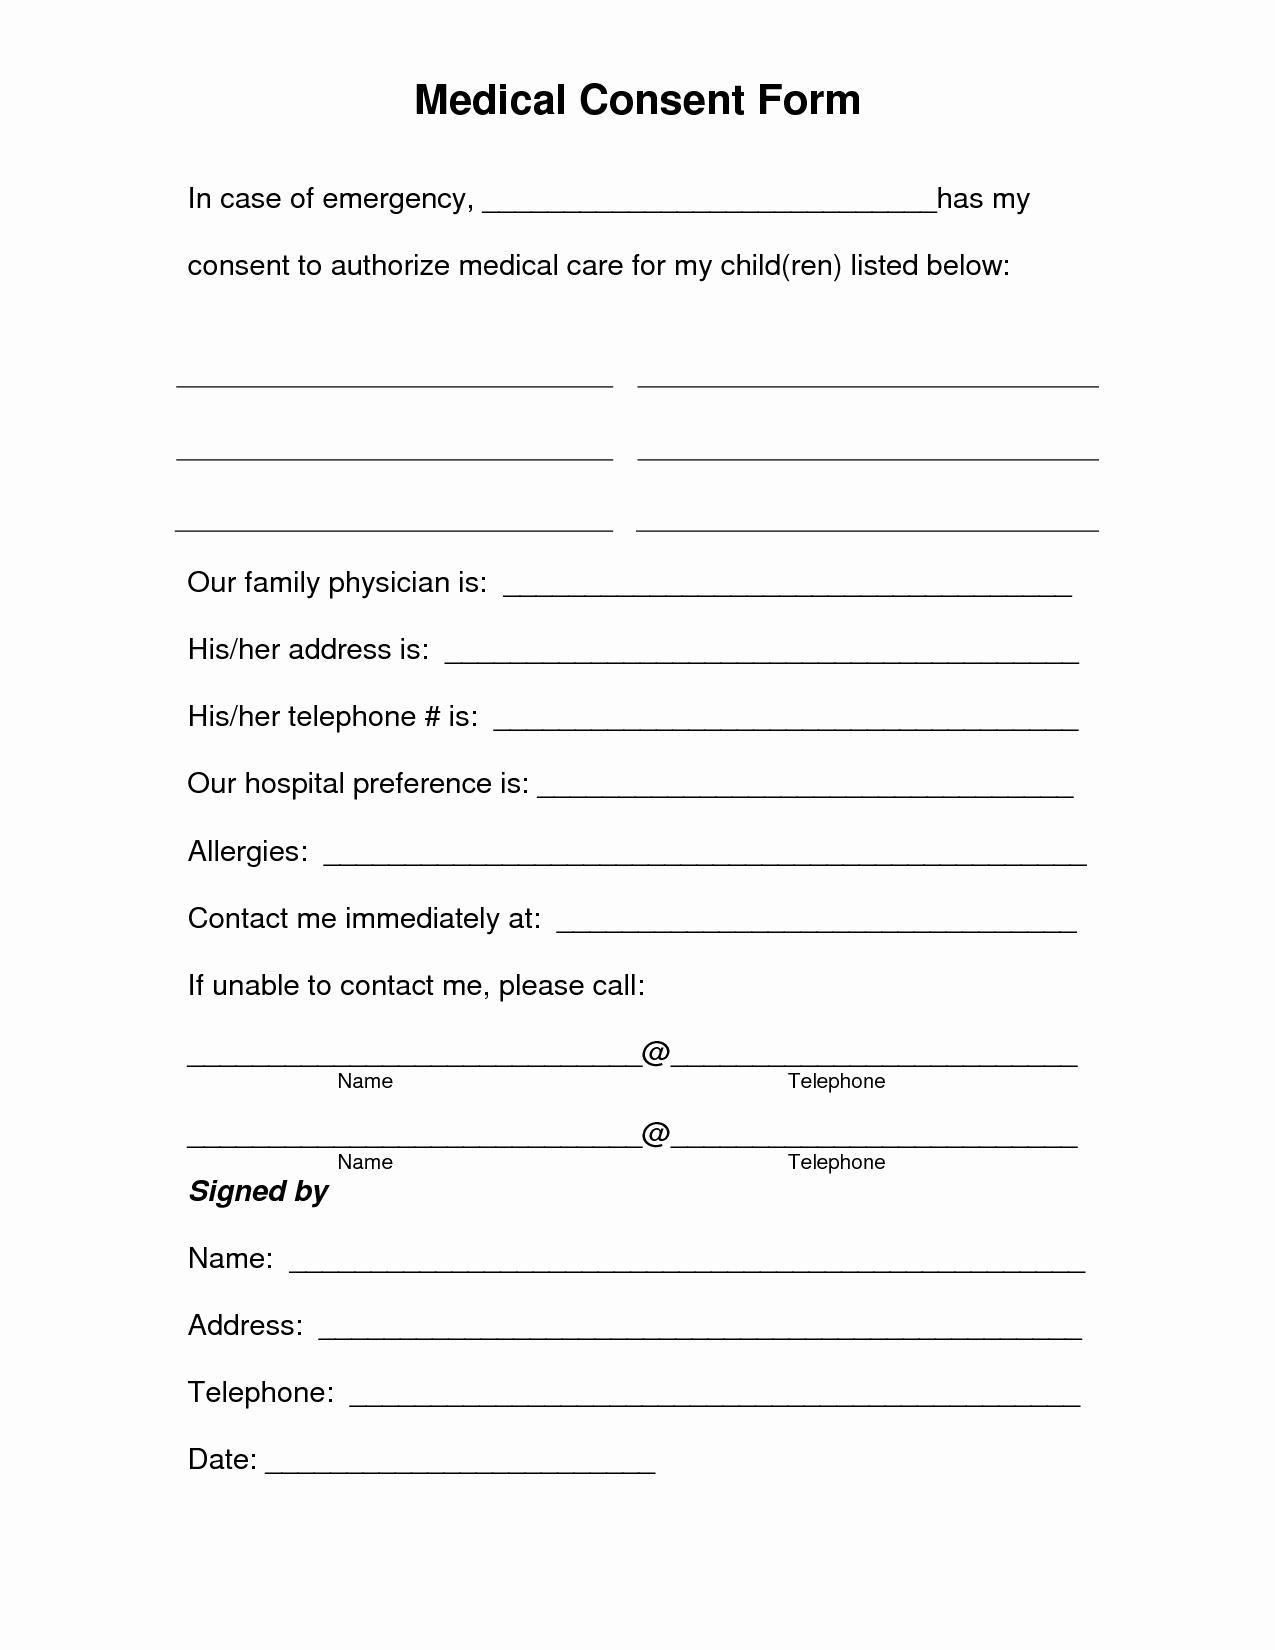 Medical Release form Template Elegant Free Printable Medical Consent form